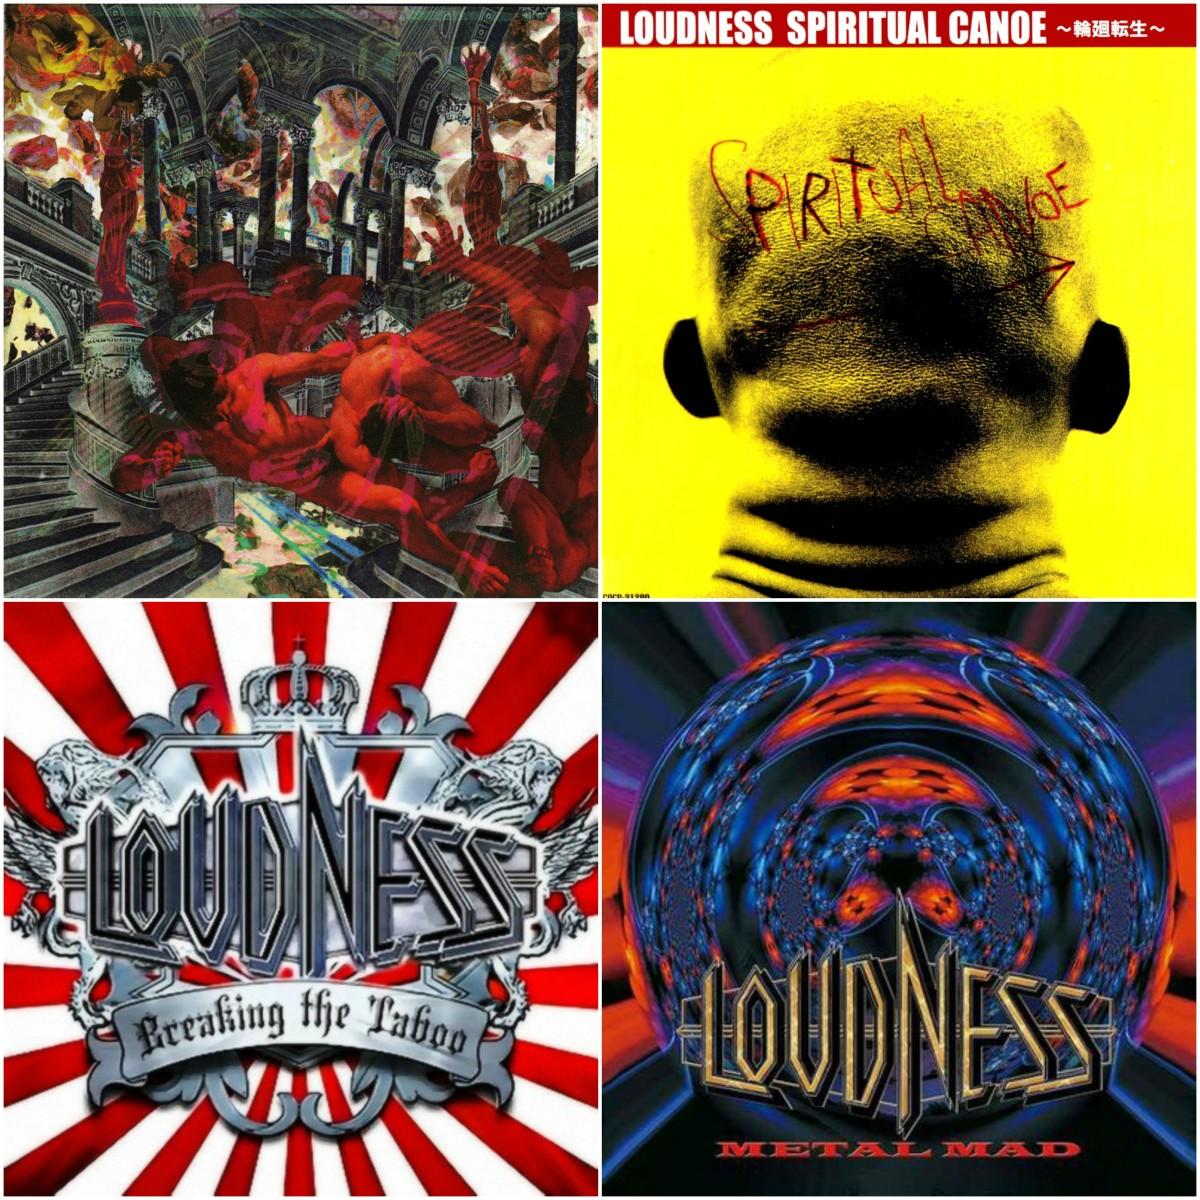 Loudness (1992), Spiritual Canoe (2001), Breaking The Taboo (2006), Metal Mad (2008)